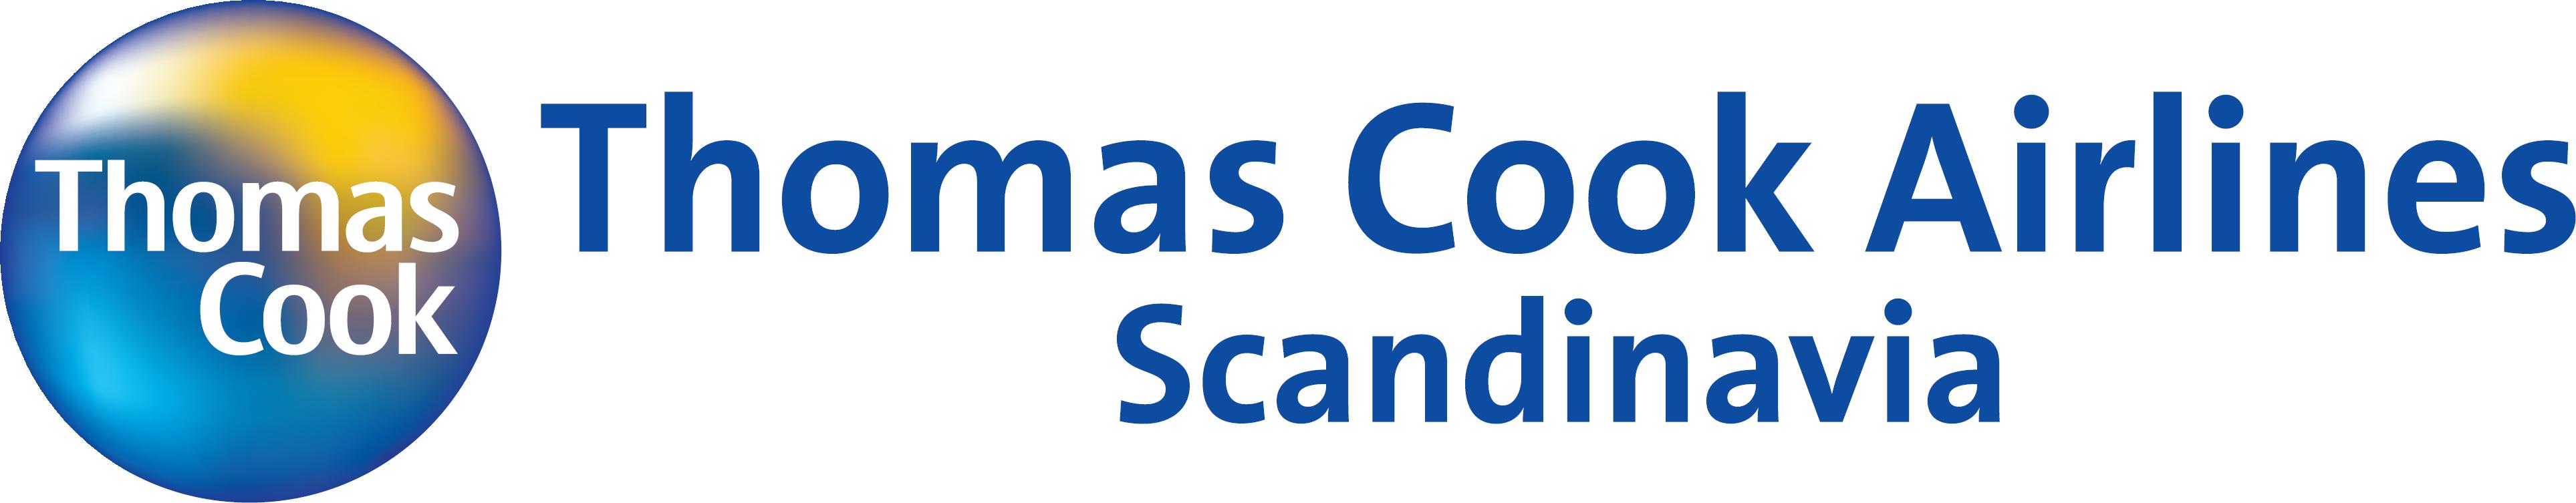 thomas cook airlines scandinavia logopedia the logo and